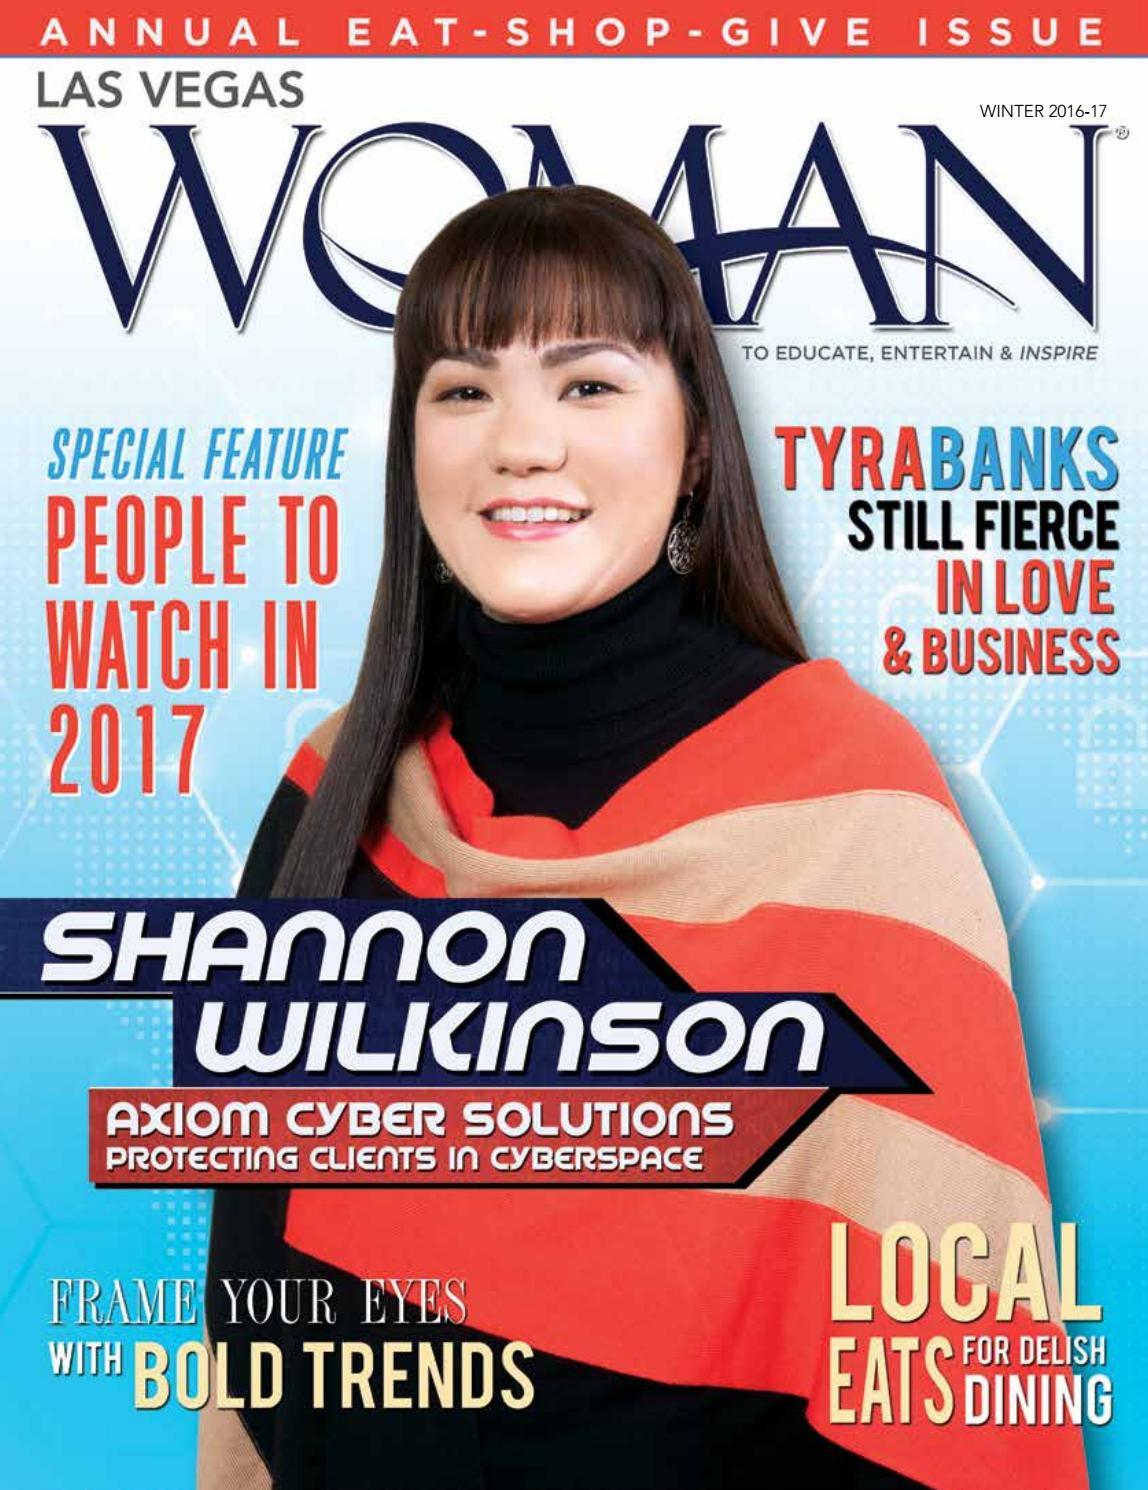 Las Vegas Woman Magazine Winter 2016